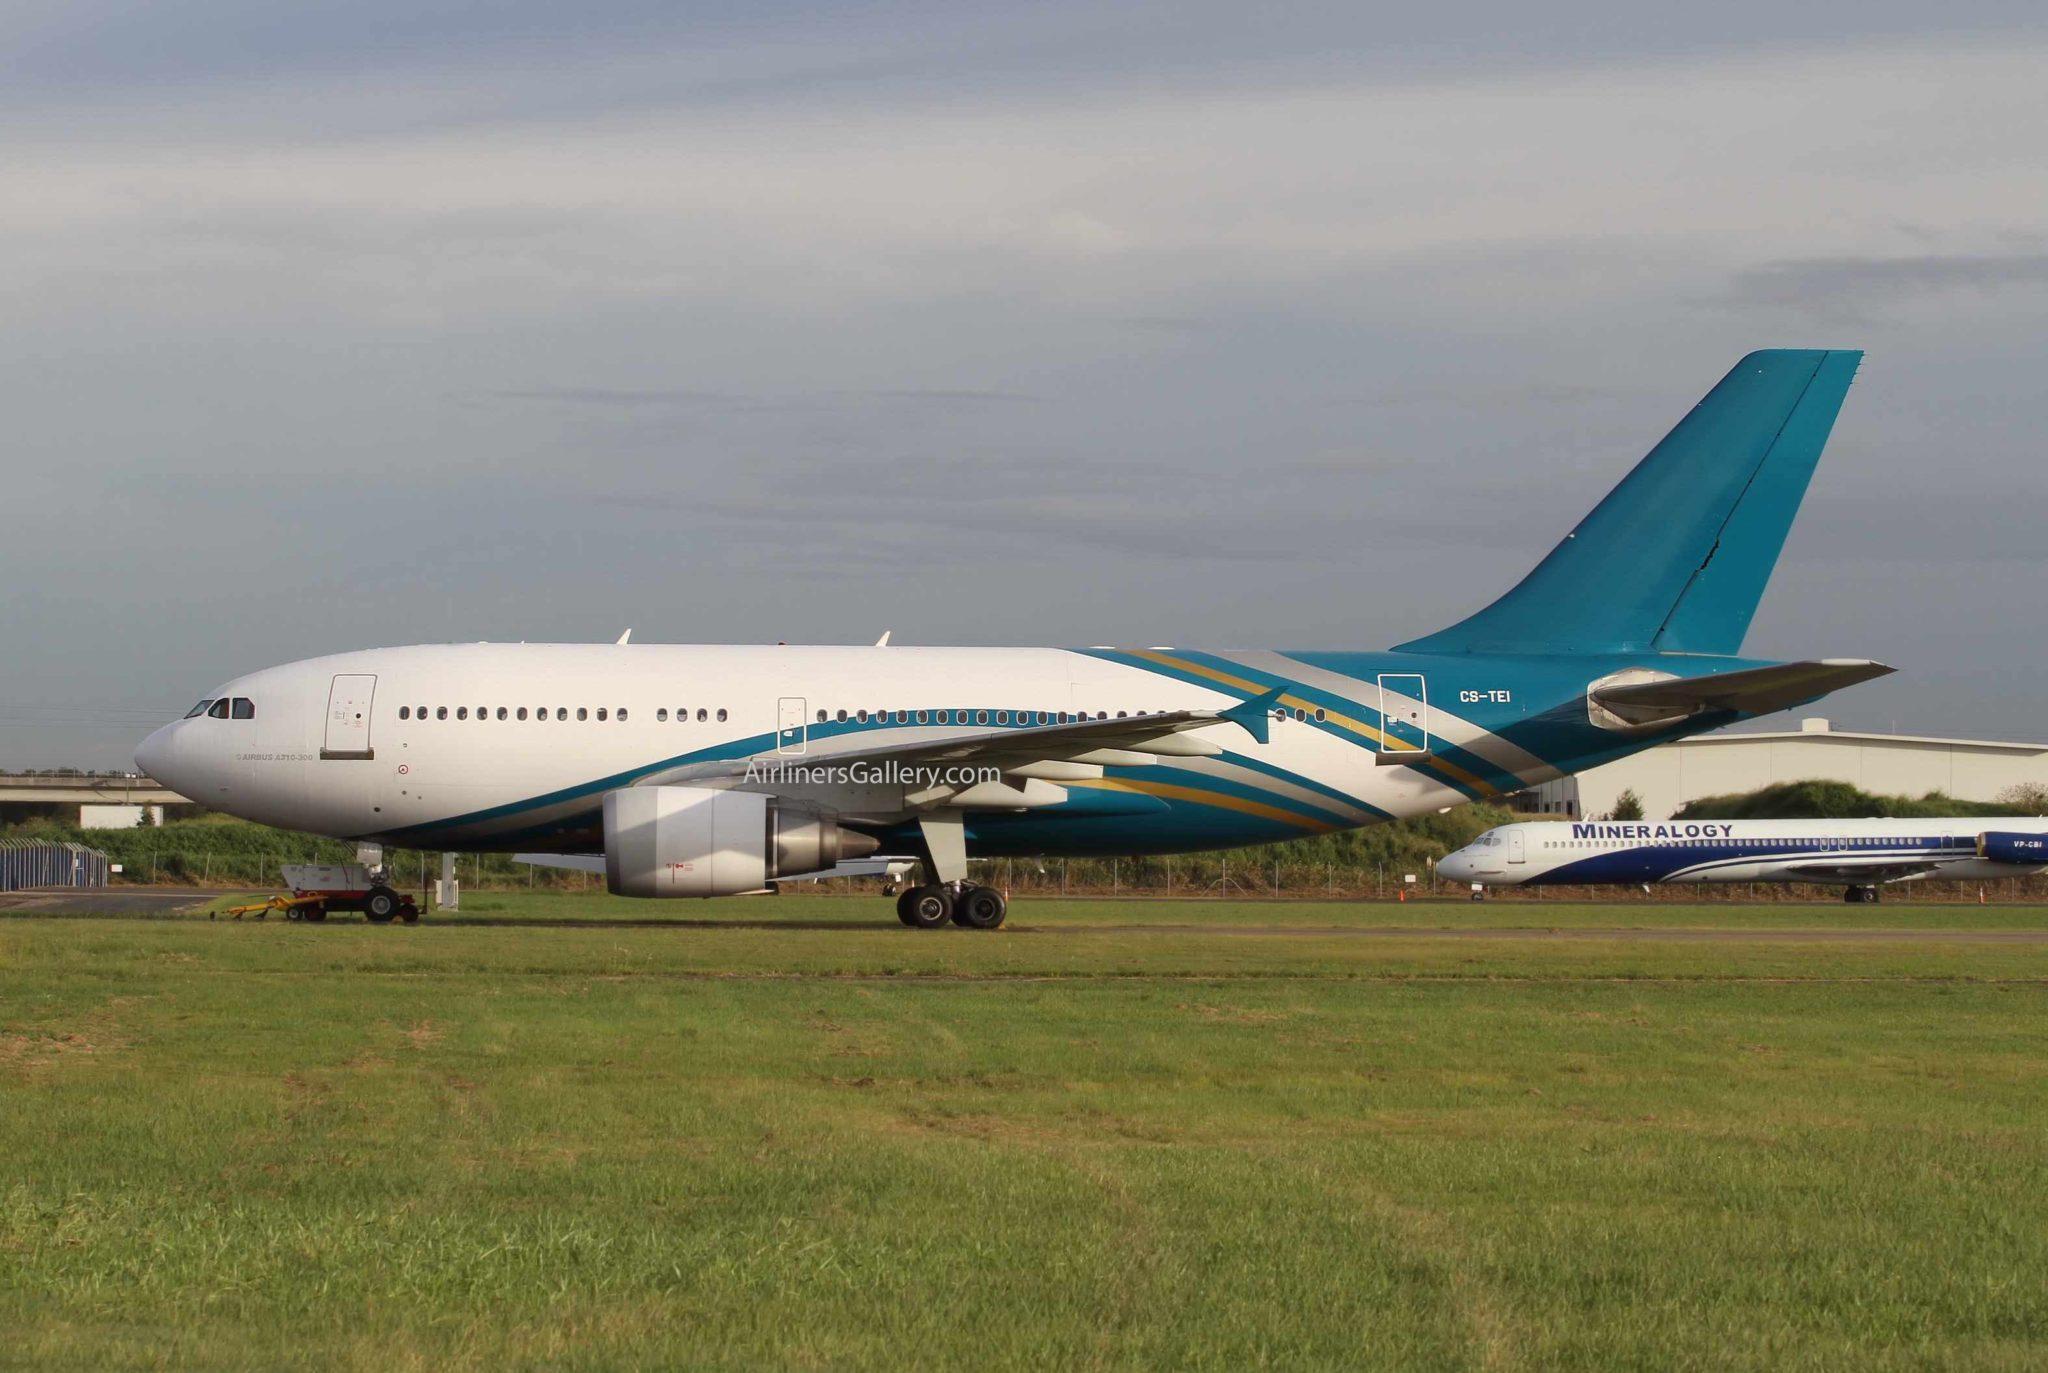 A310 300  A310 300 ER 1 - A310-300, A310-300 ER